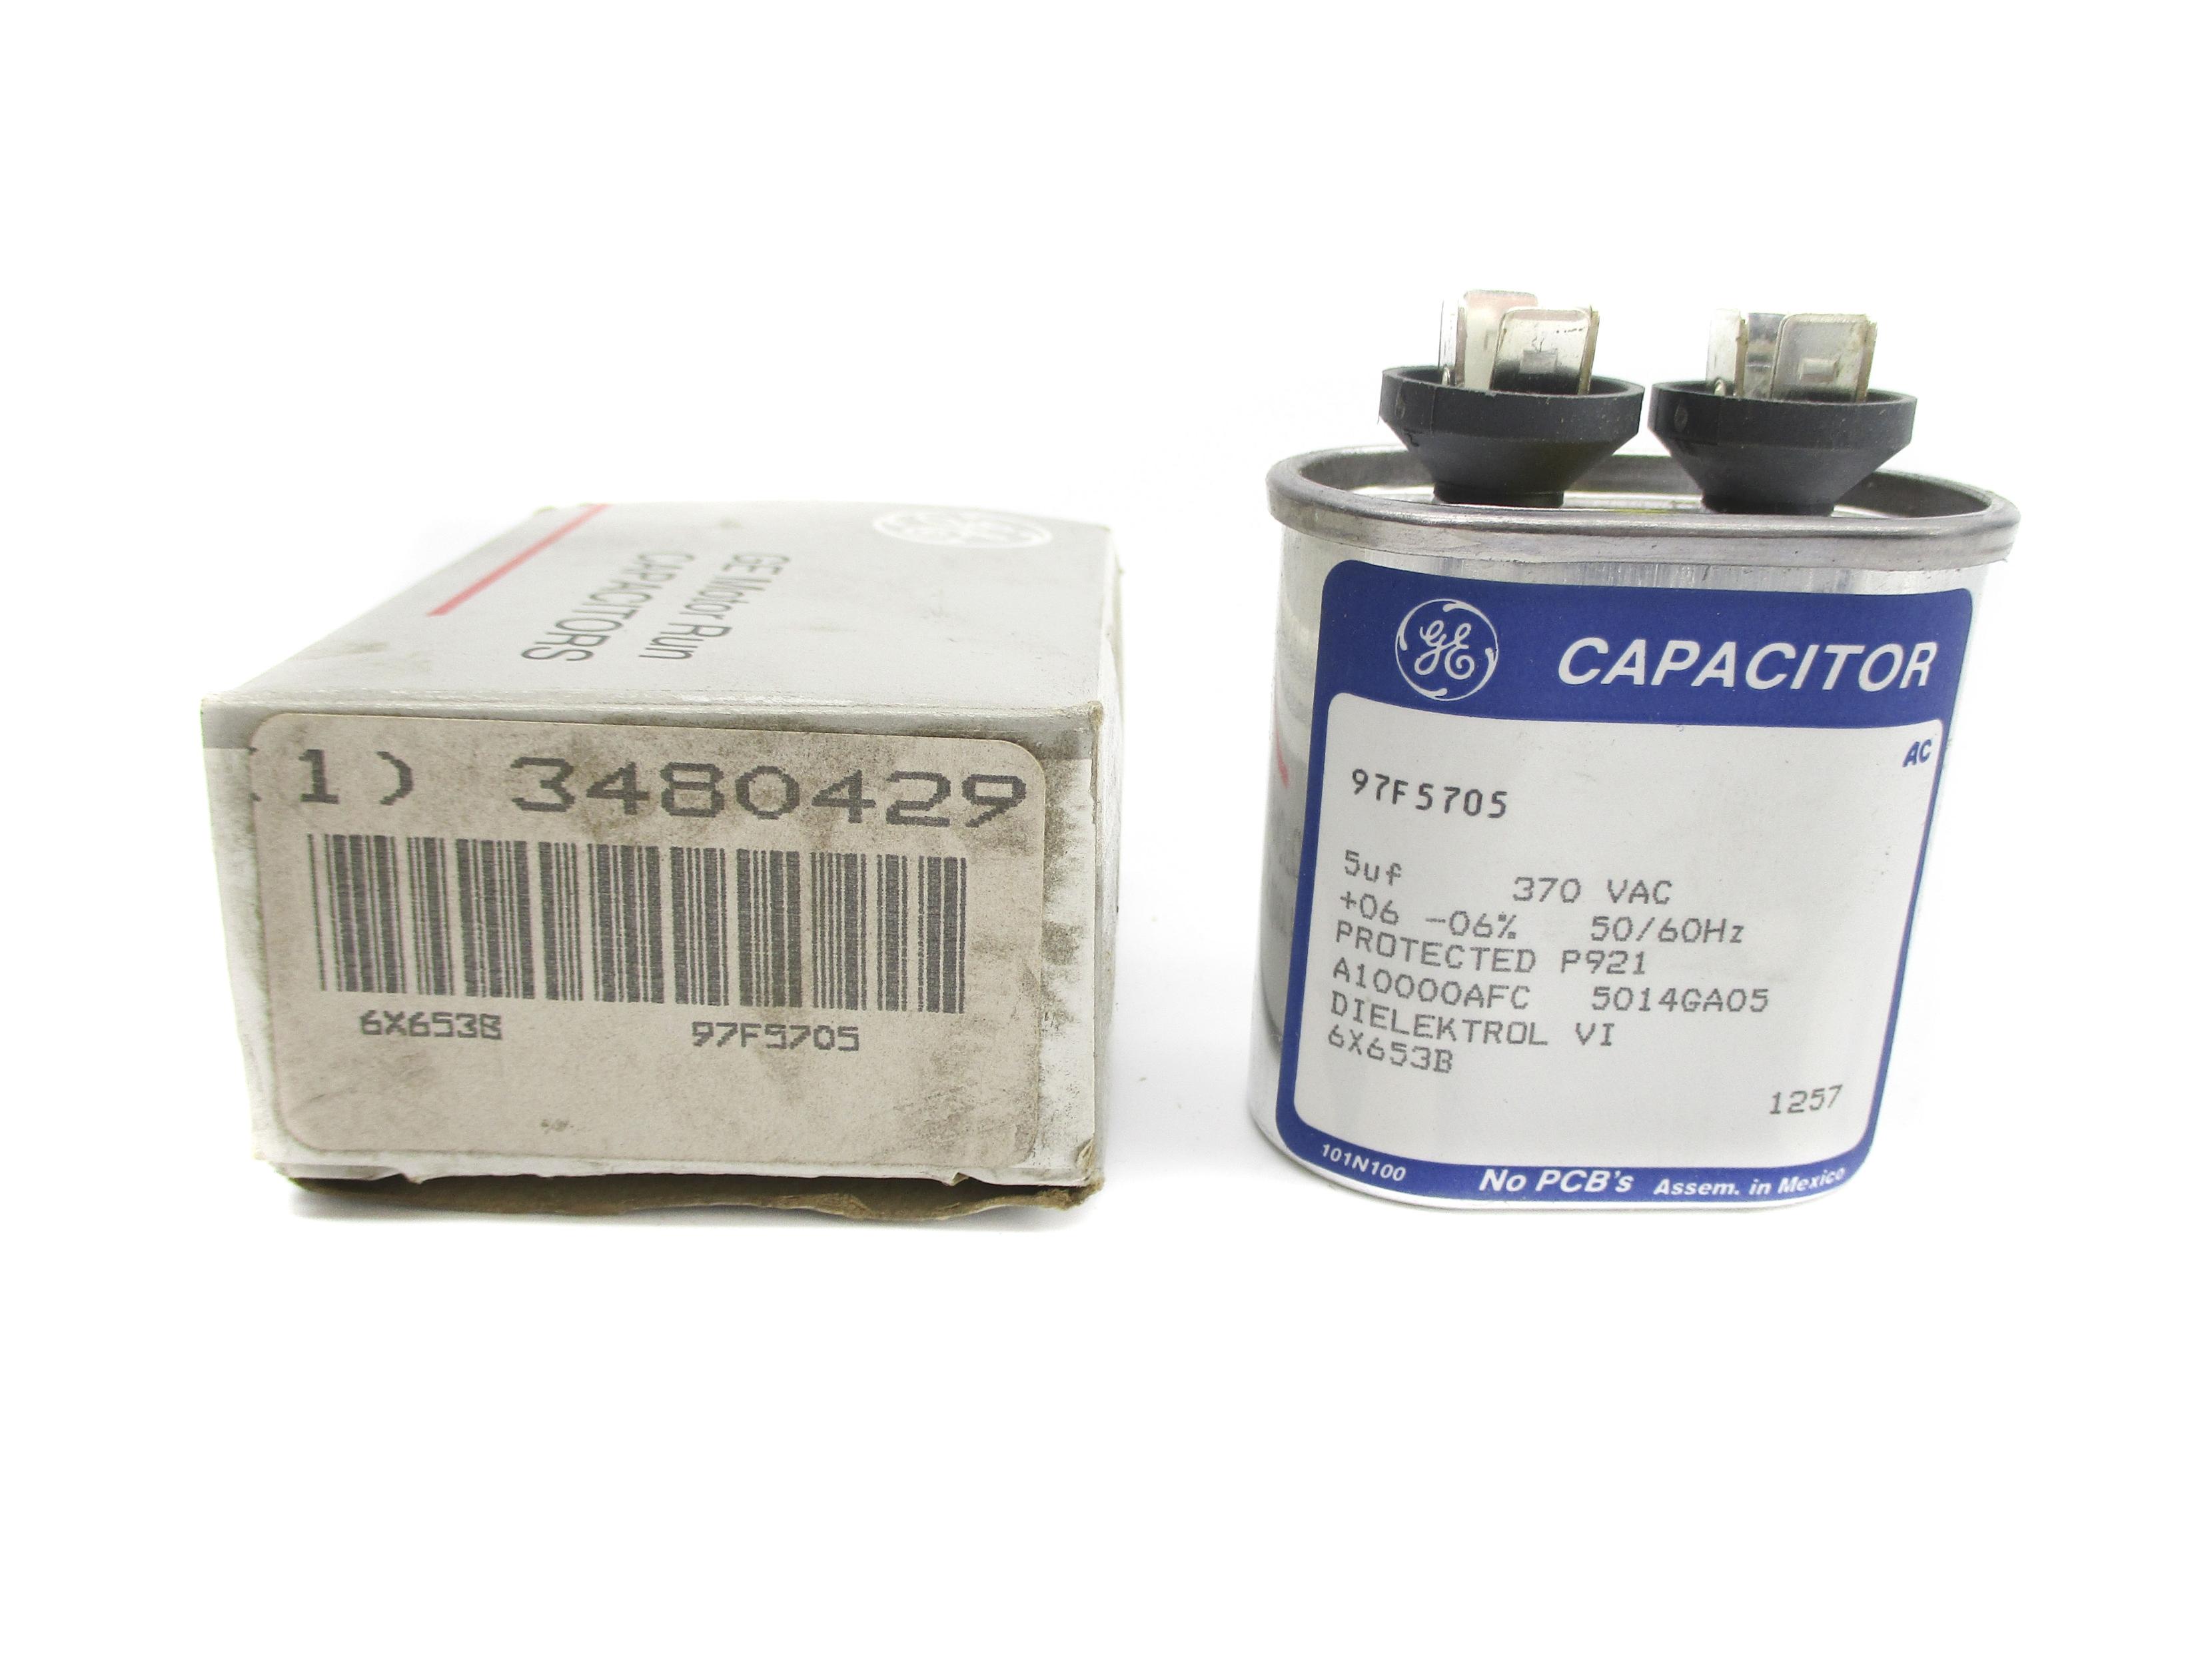 GENERAL ELECTRIC 6X653B Z97F5705 NSMP